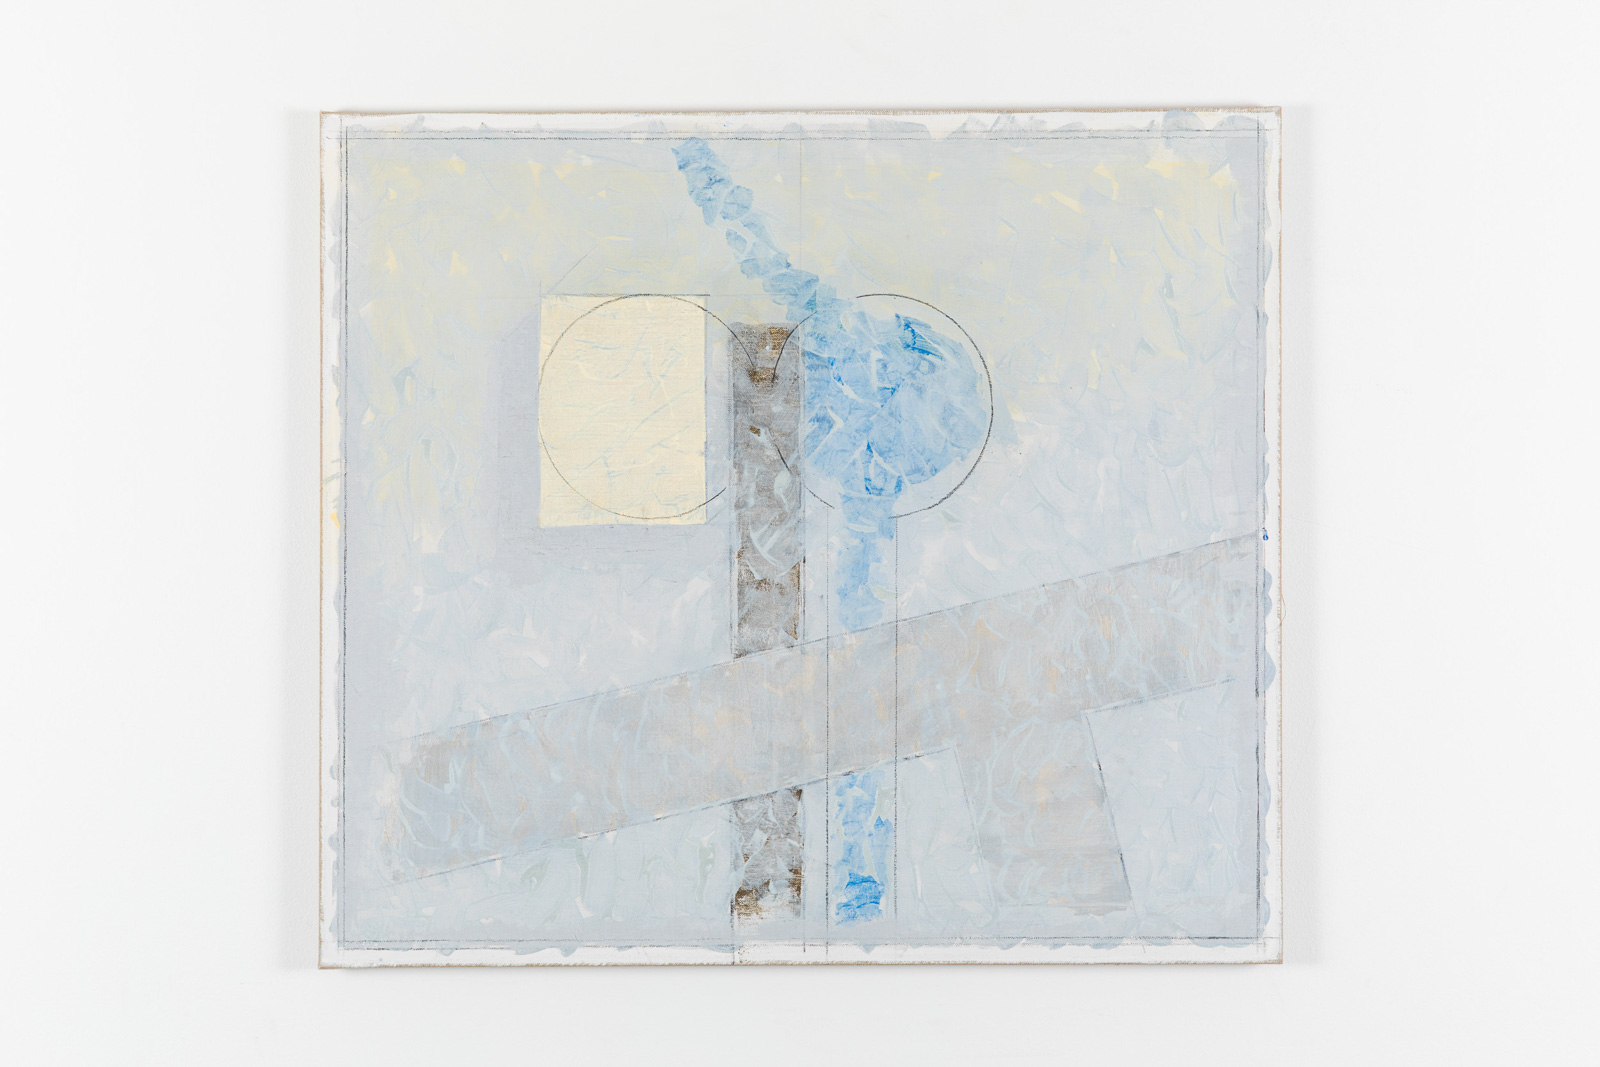 Vila Ziza 20, 2018, Egg tempera on canvas, 80 x 90 cm